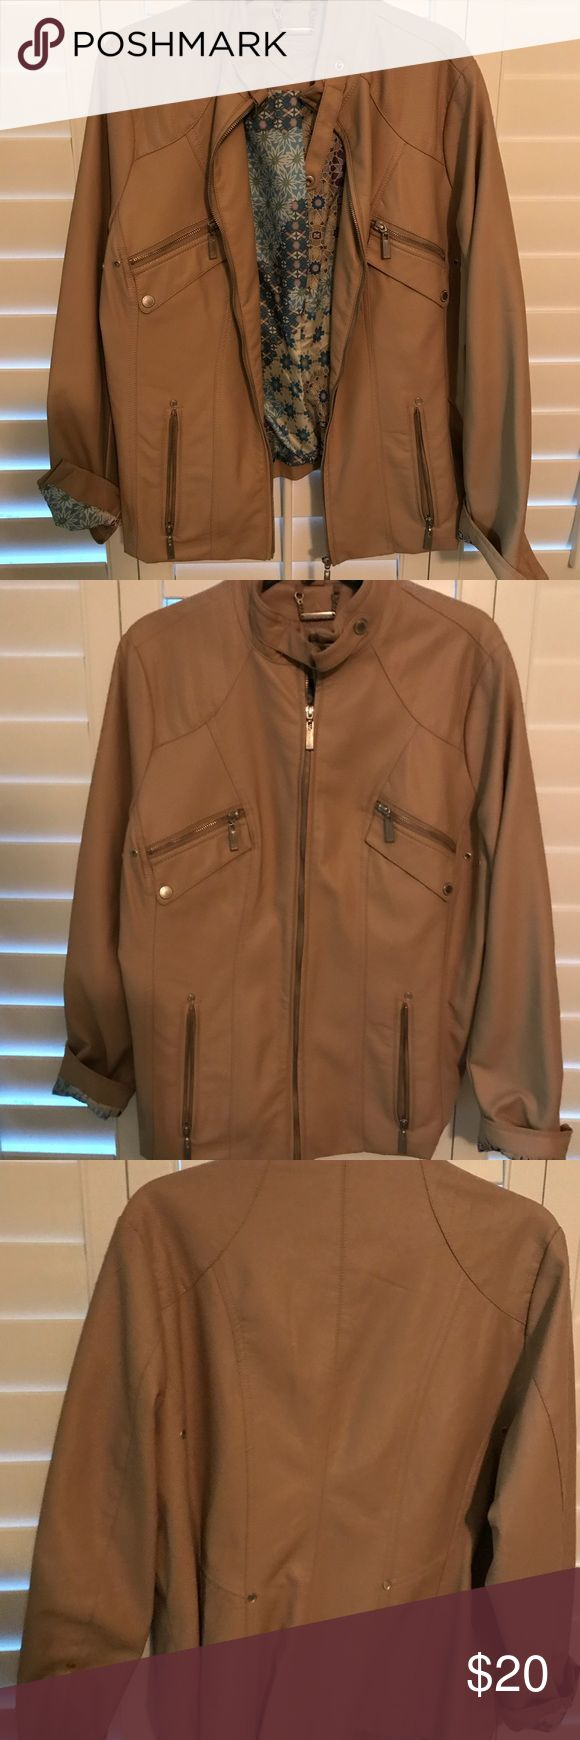 JouJou Jacket Vegan Leather Jacket. Very light tan color